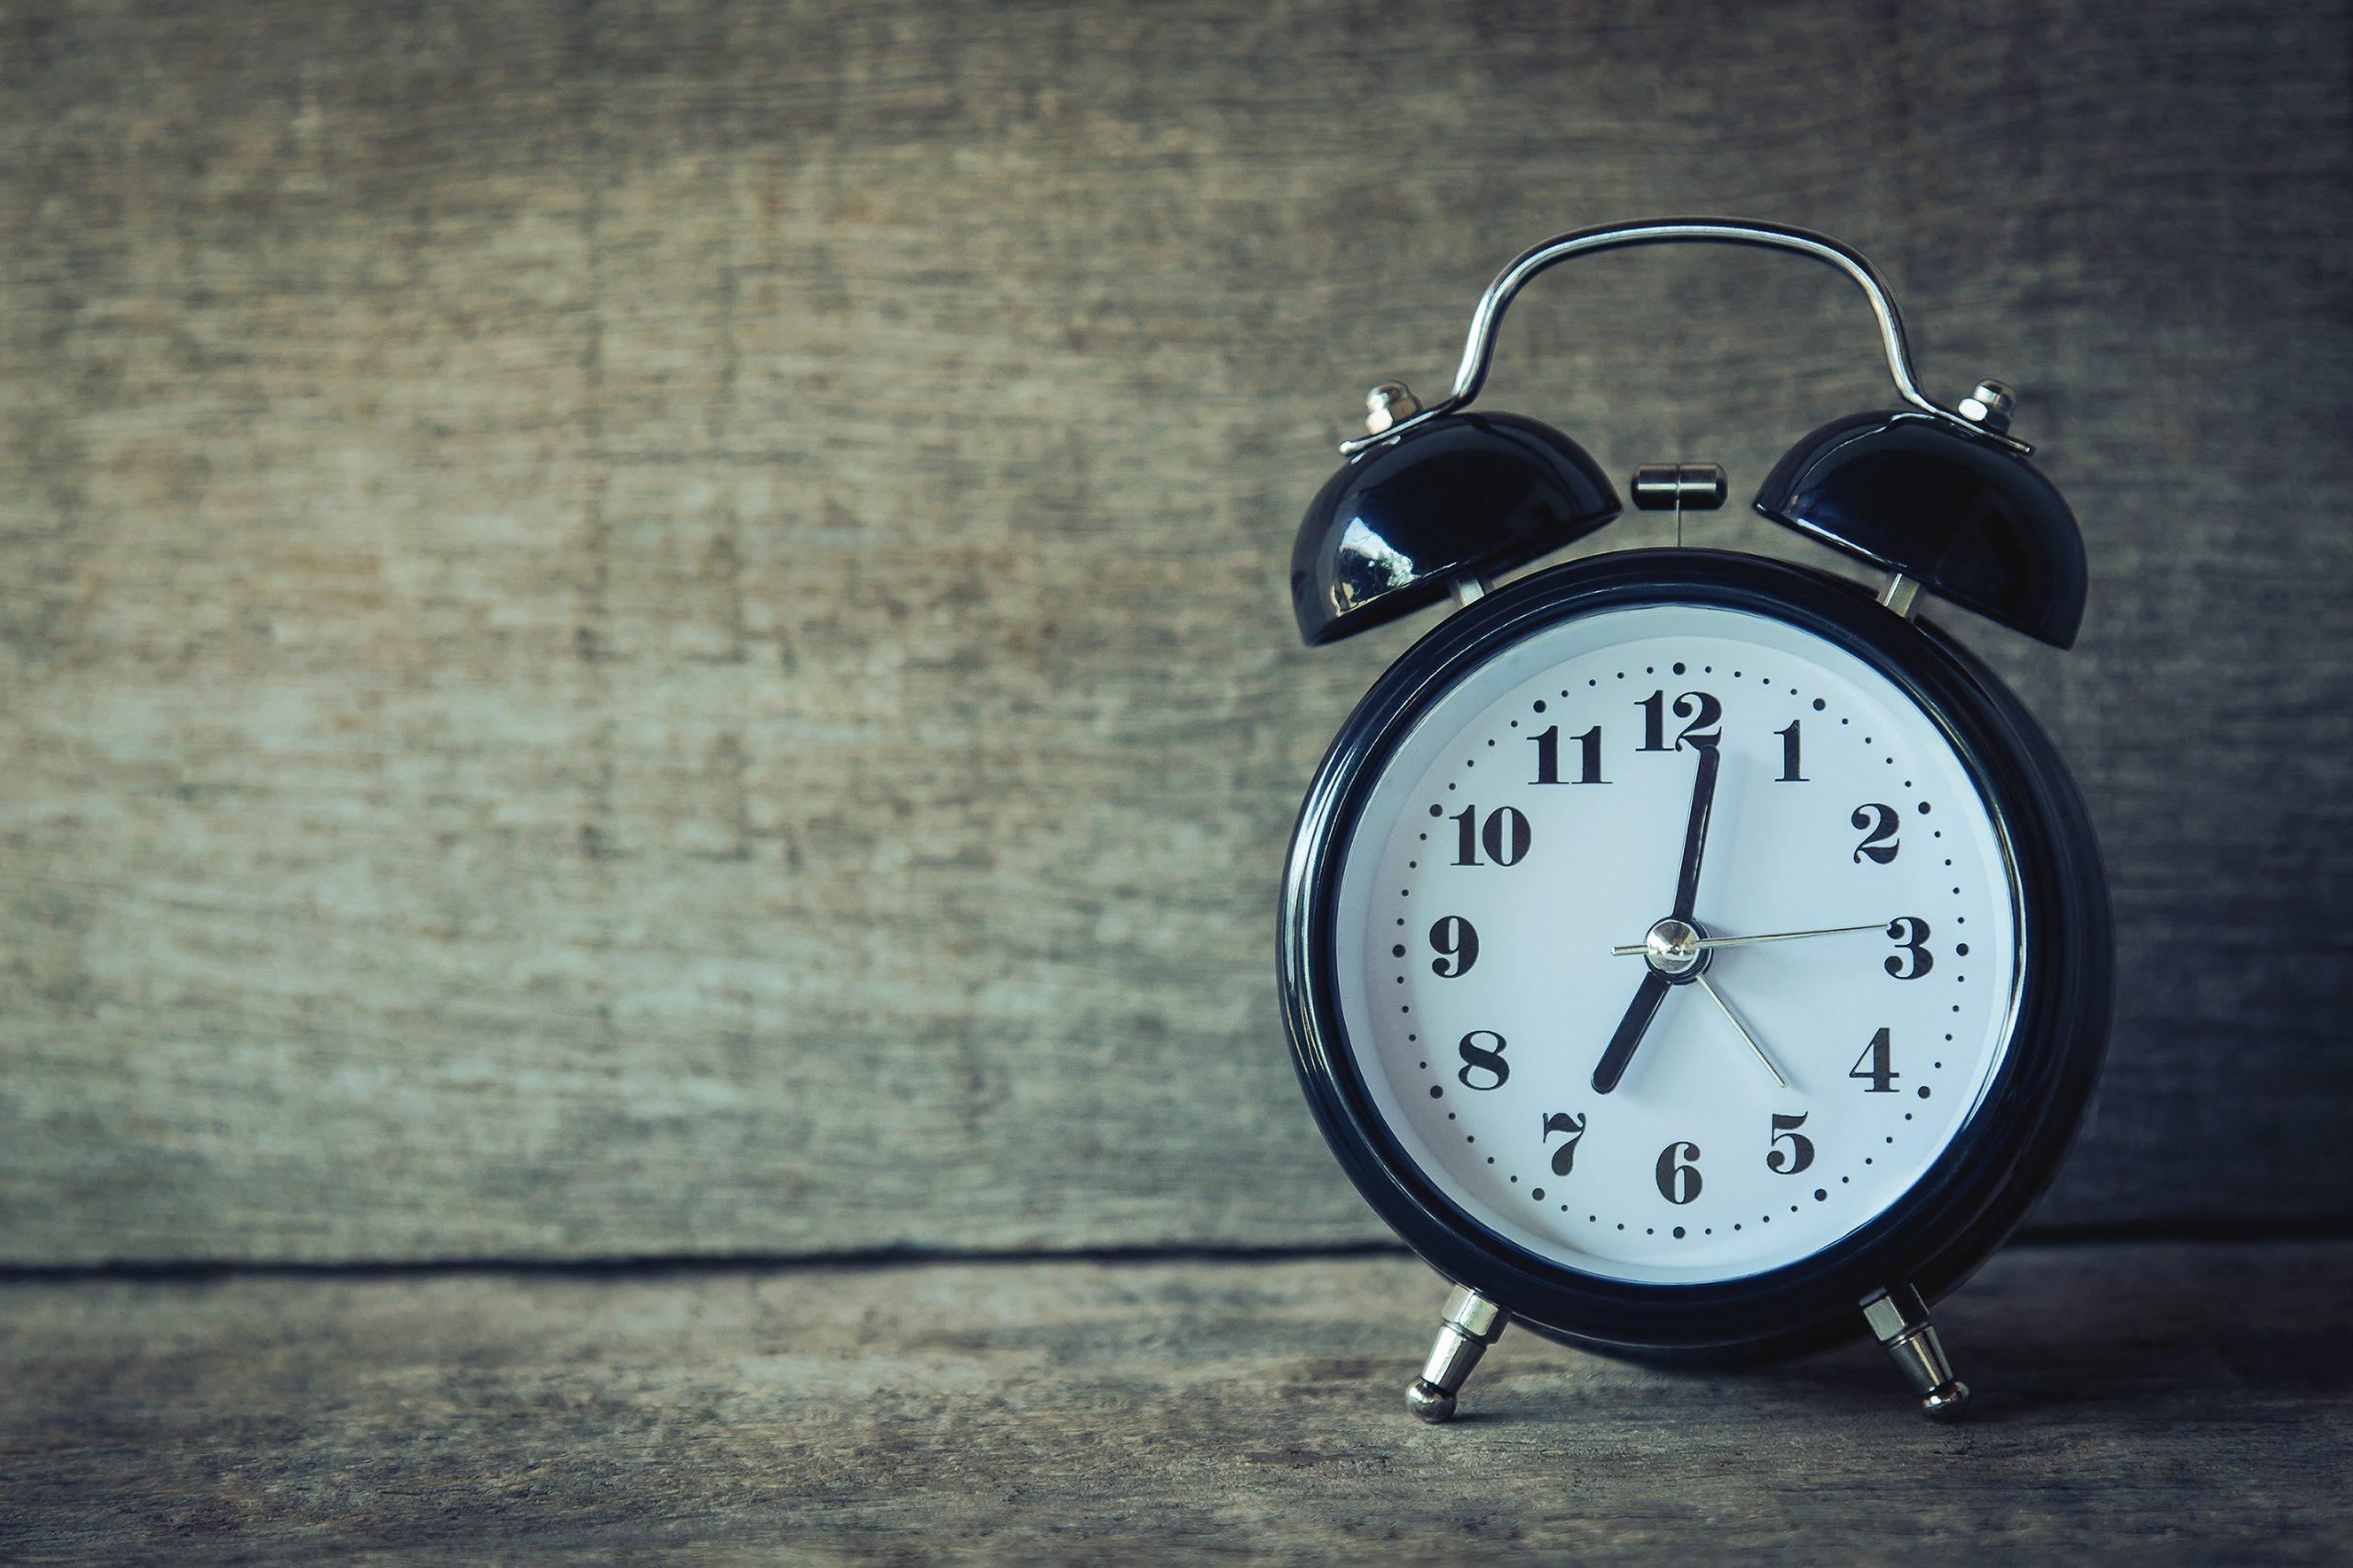 Black analog alarm clock at 7 01